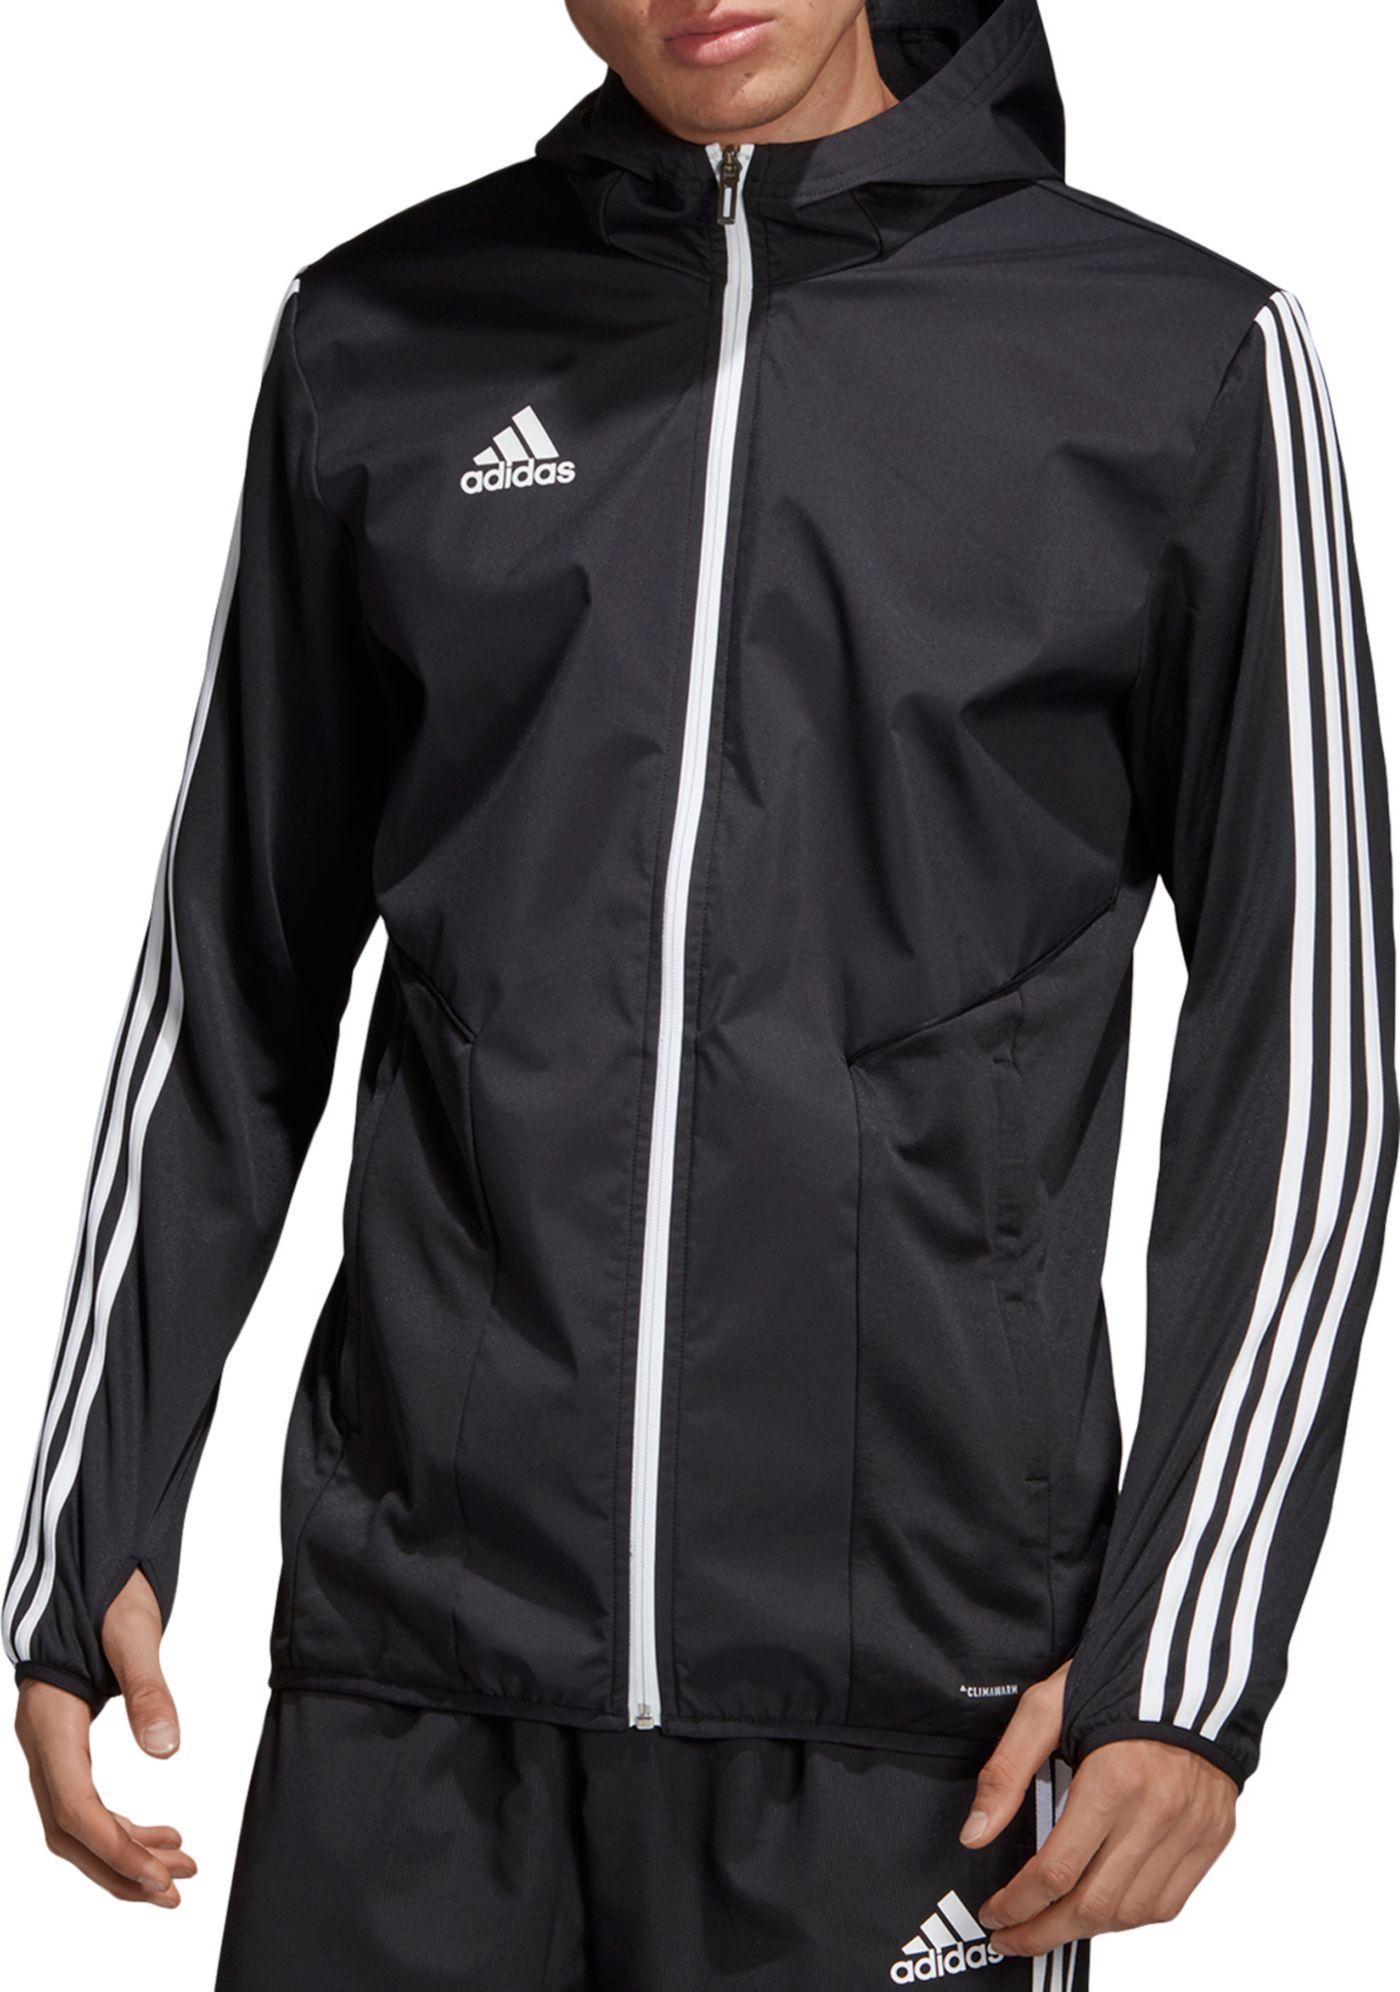 adidas Men's Tiro 19 Warm Soccer Jacket